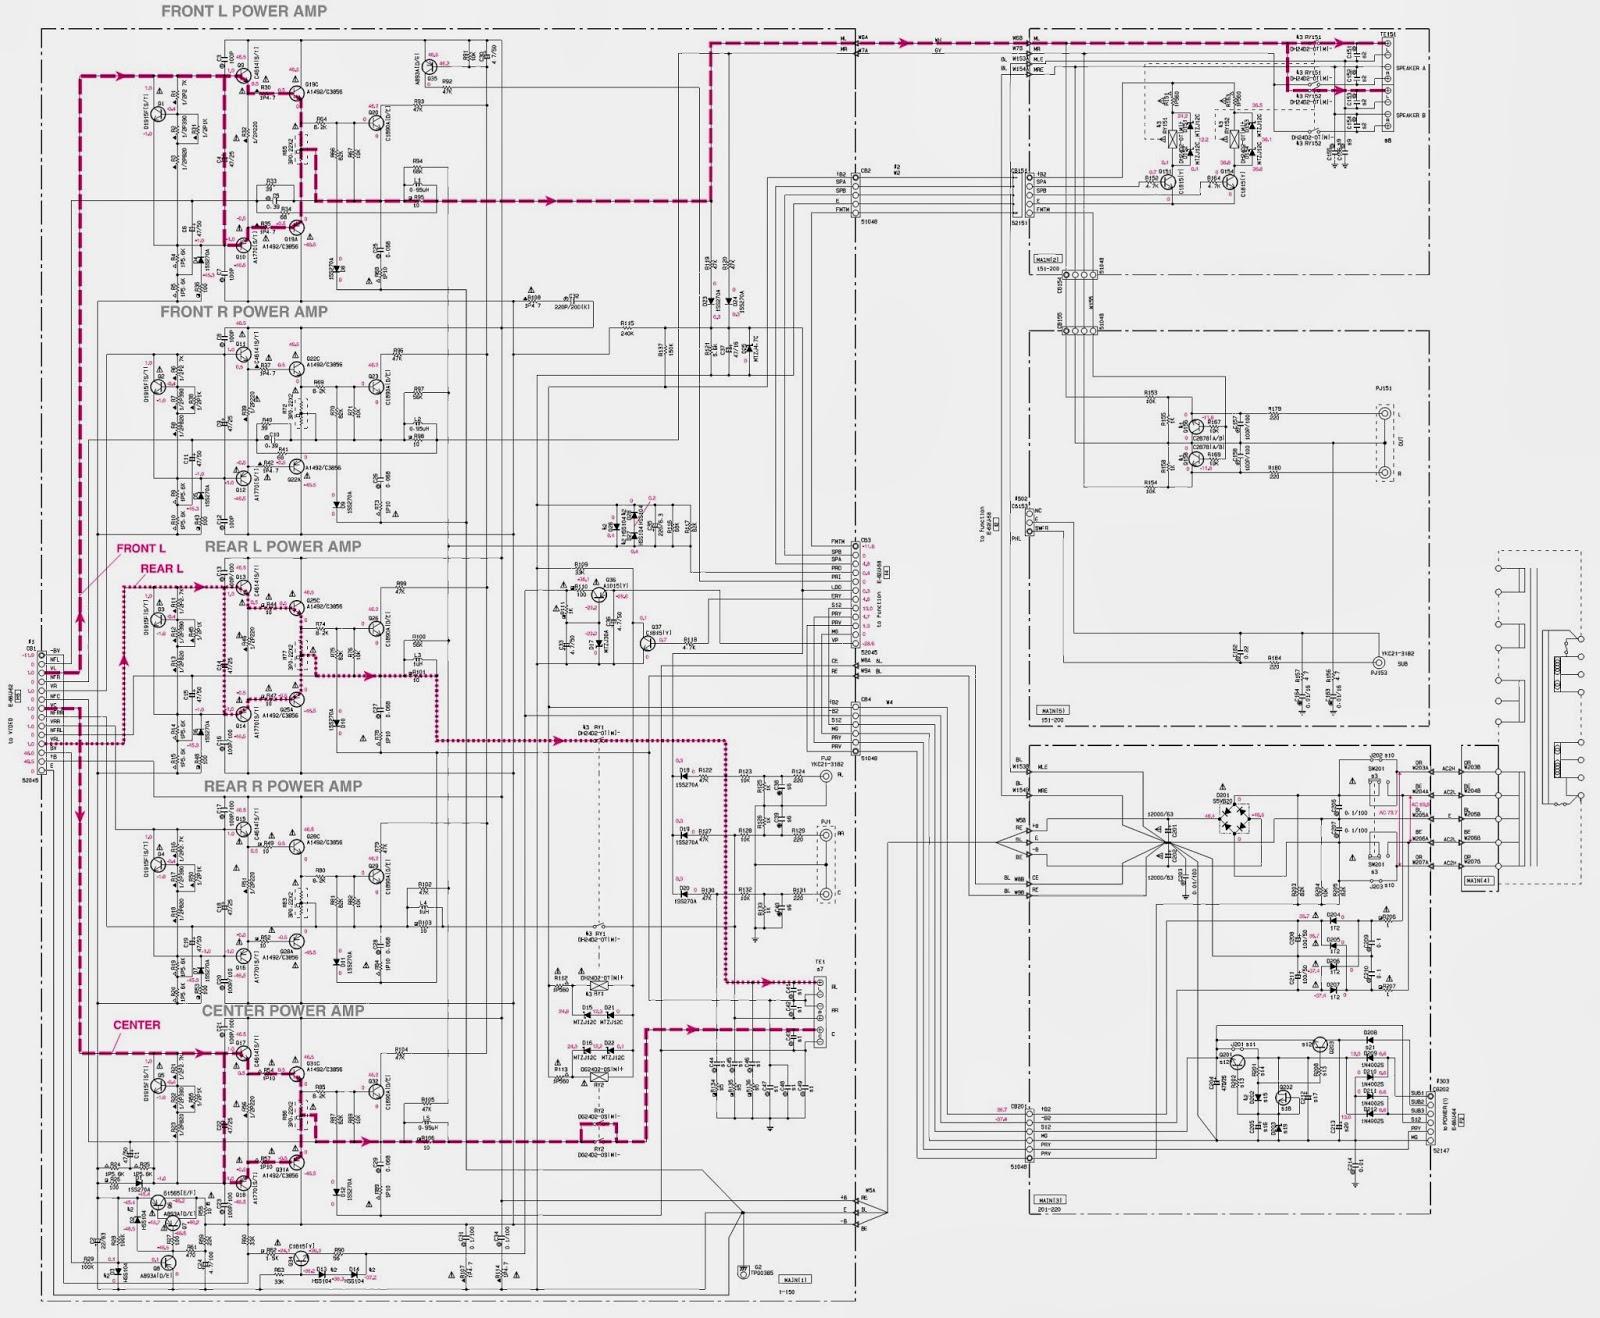 hight resolution of yamaha rx v800 rx v800rds htr 5280 u2013 av receiver power amp schematicamp schematic circuit diagram